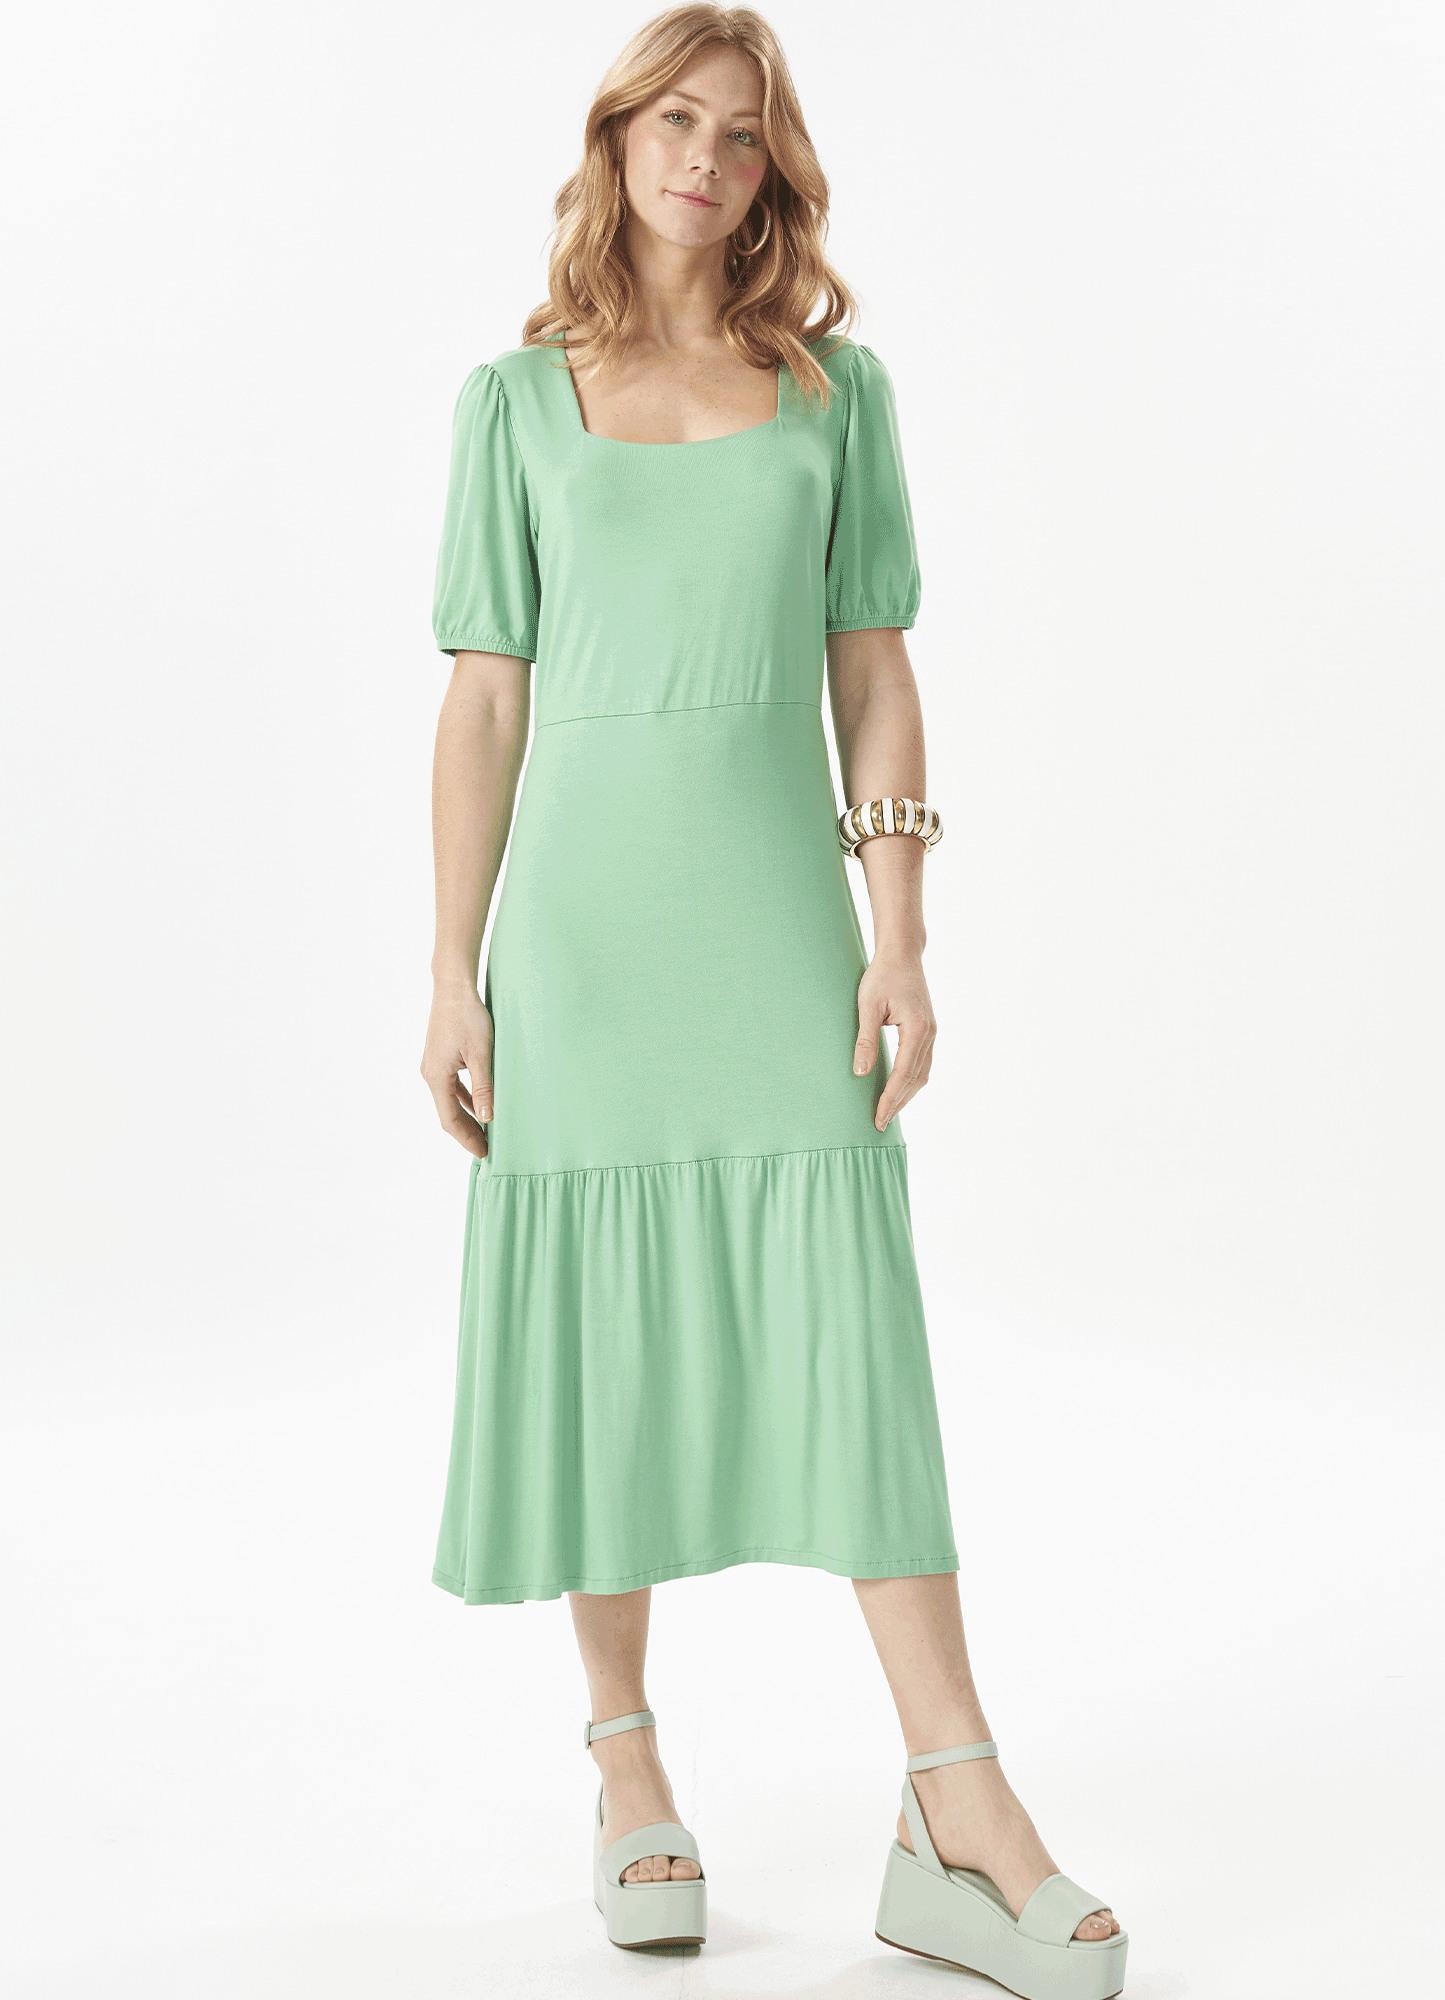 Vestido Feminino Plus Size Malha Verde 3 Marias Decote Quadrado